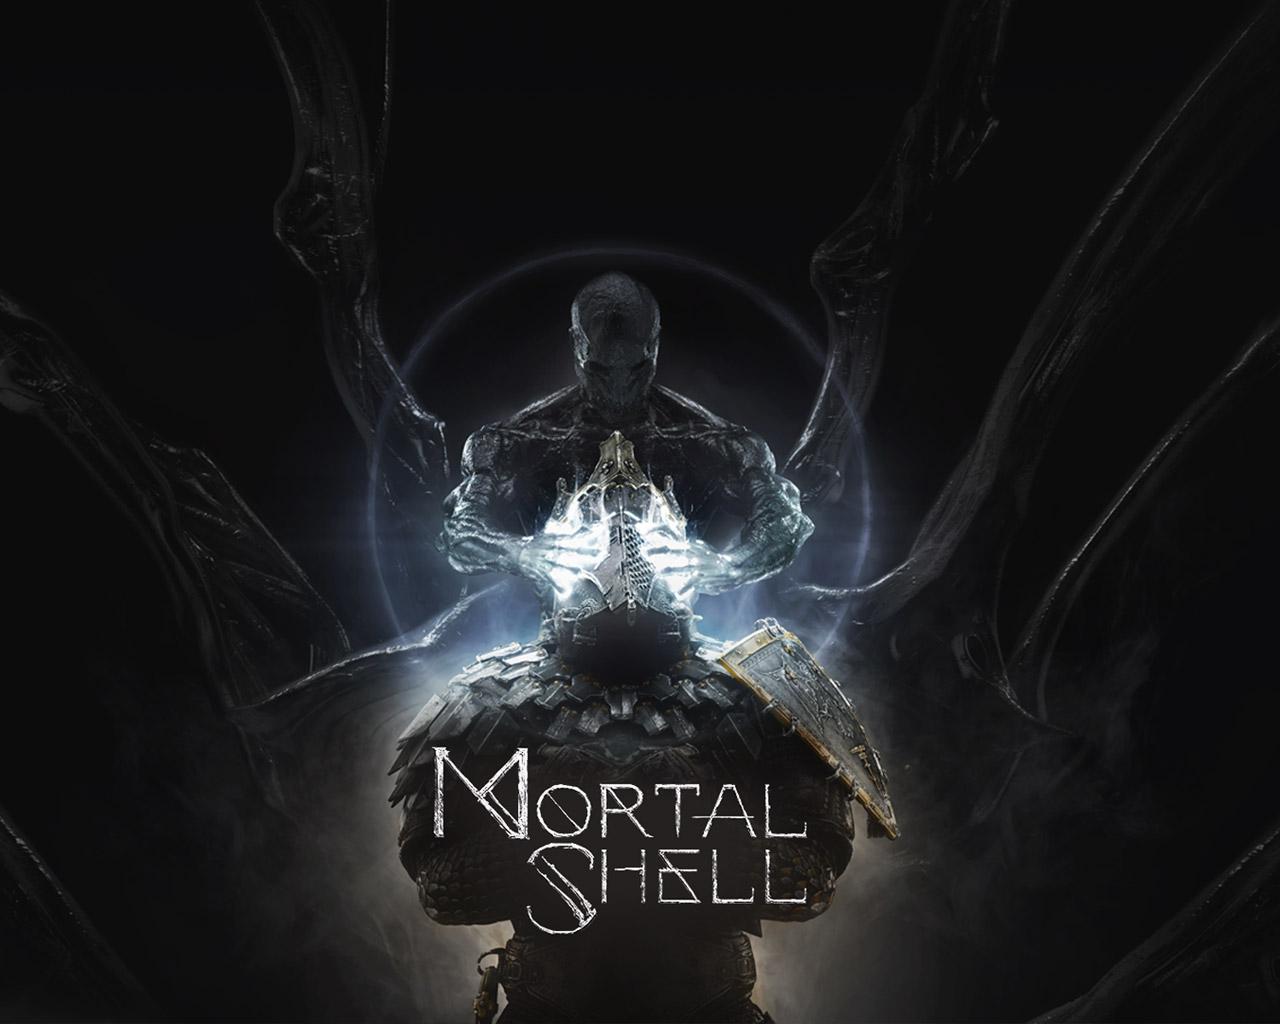 Mortal Shell Wallpaper in 1280x1024